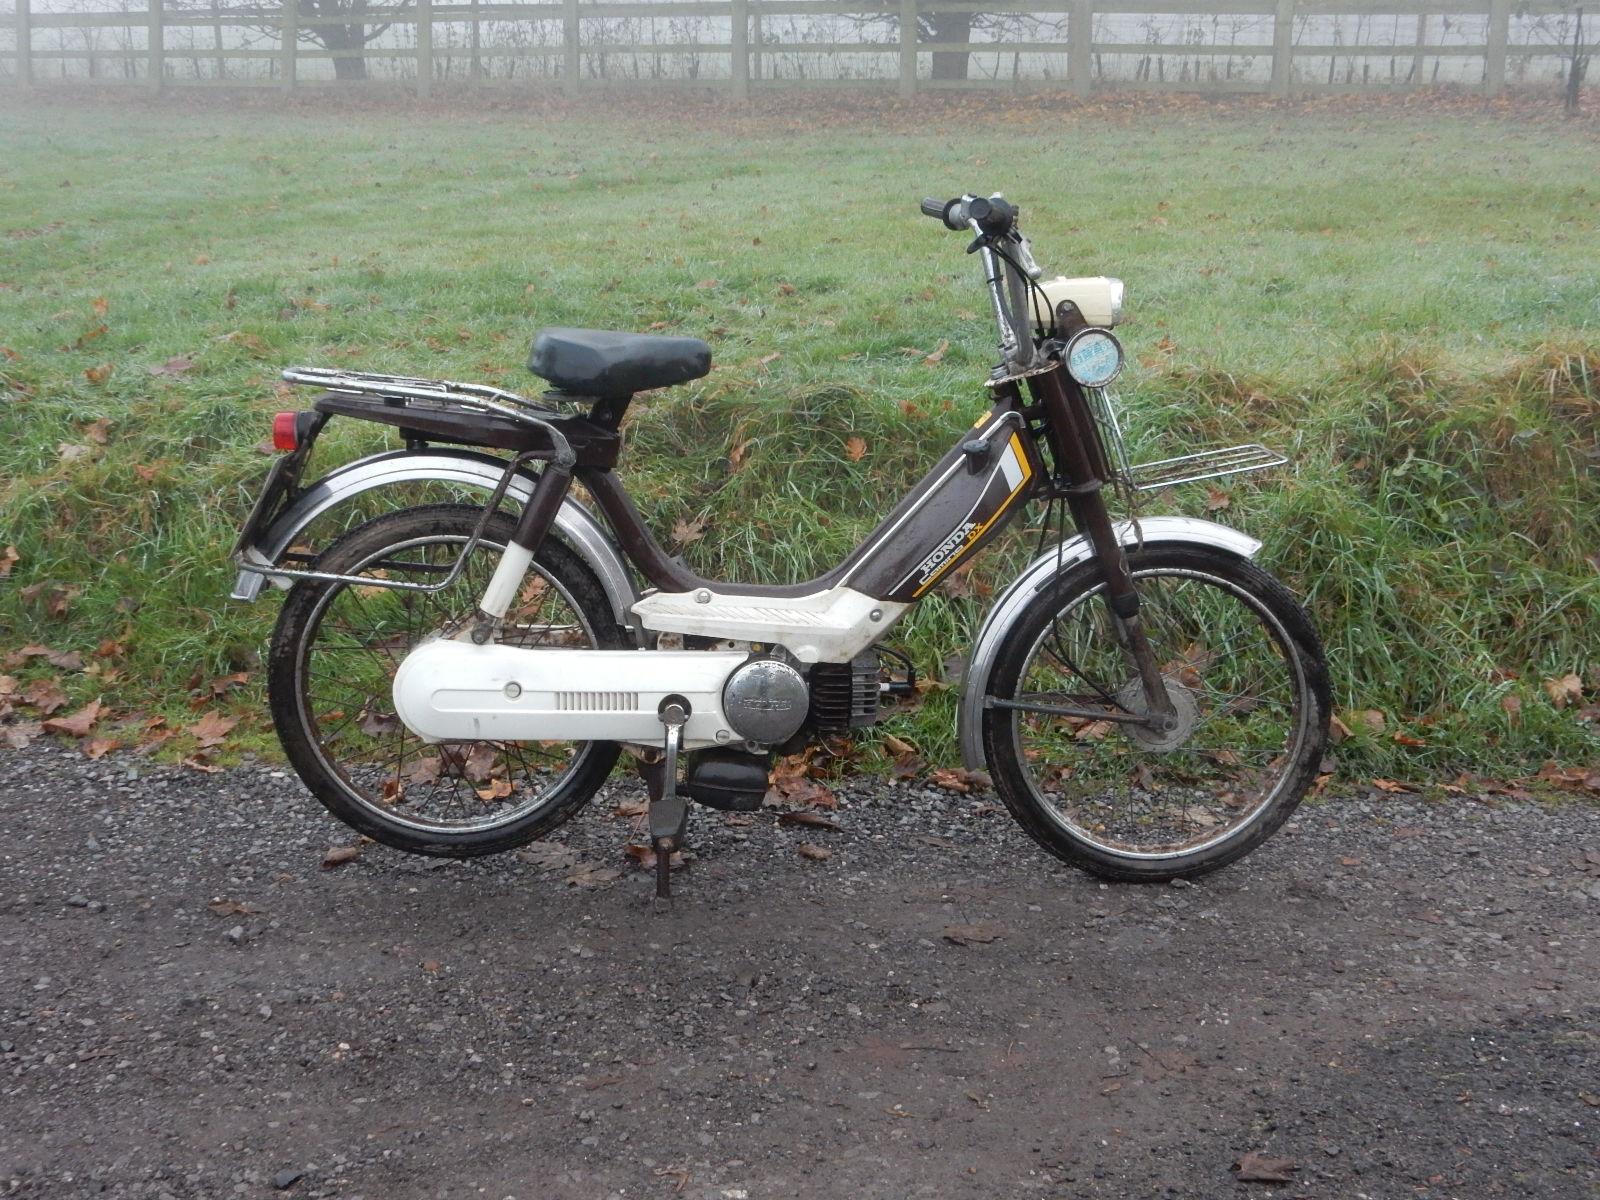 Honda PA Camino Moped